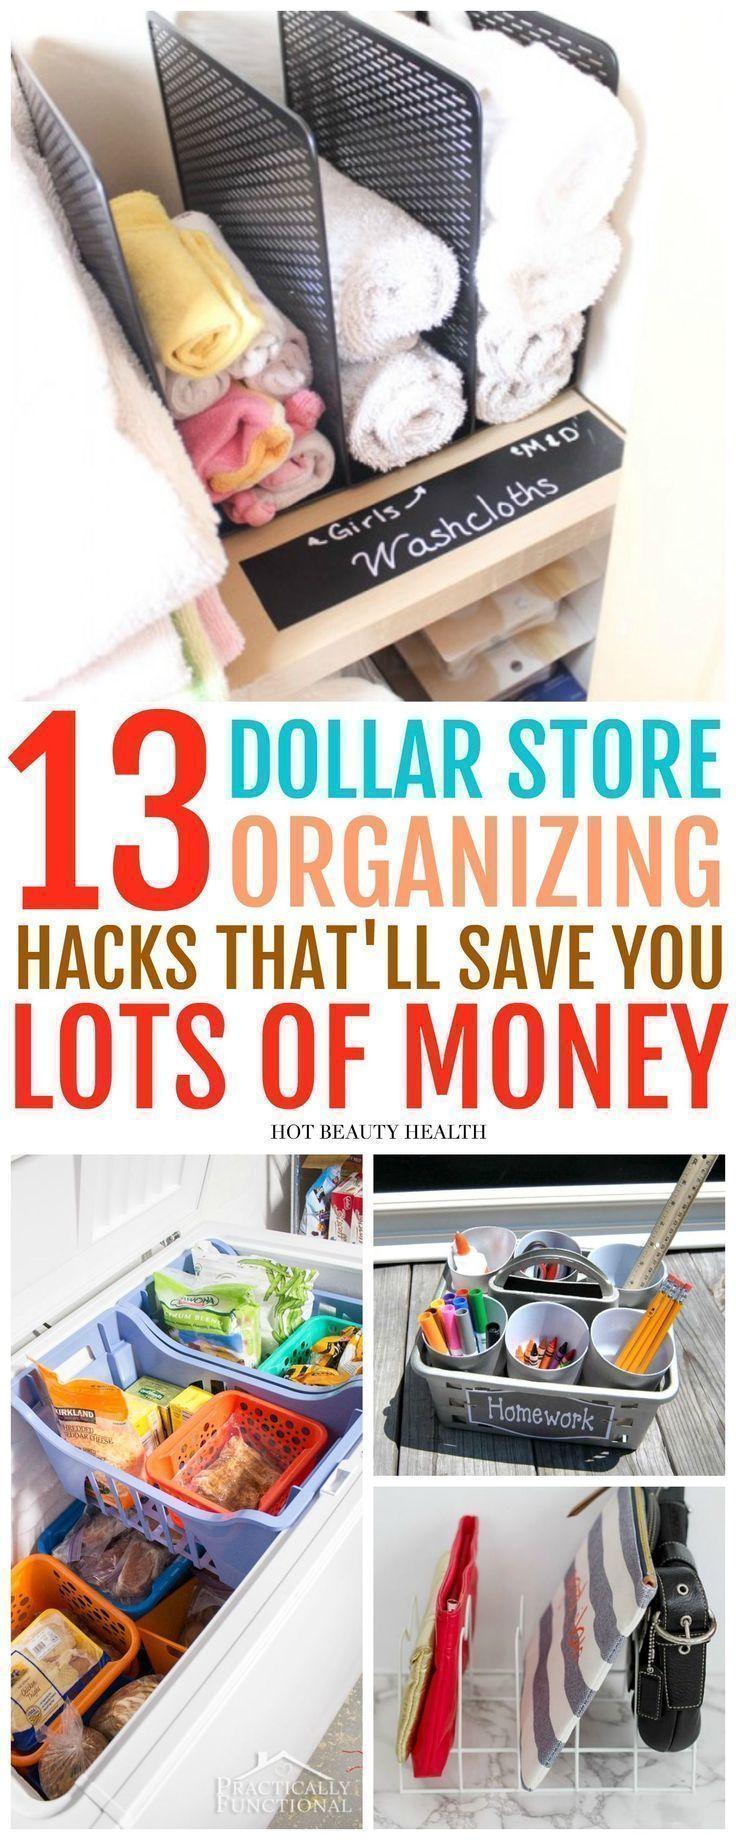 13 Creative Dollar Store Organizing Hacks You'll Love